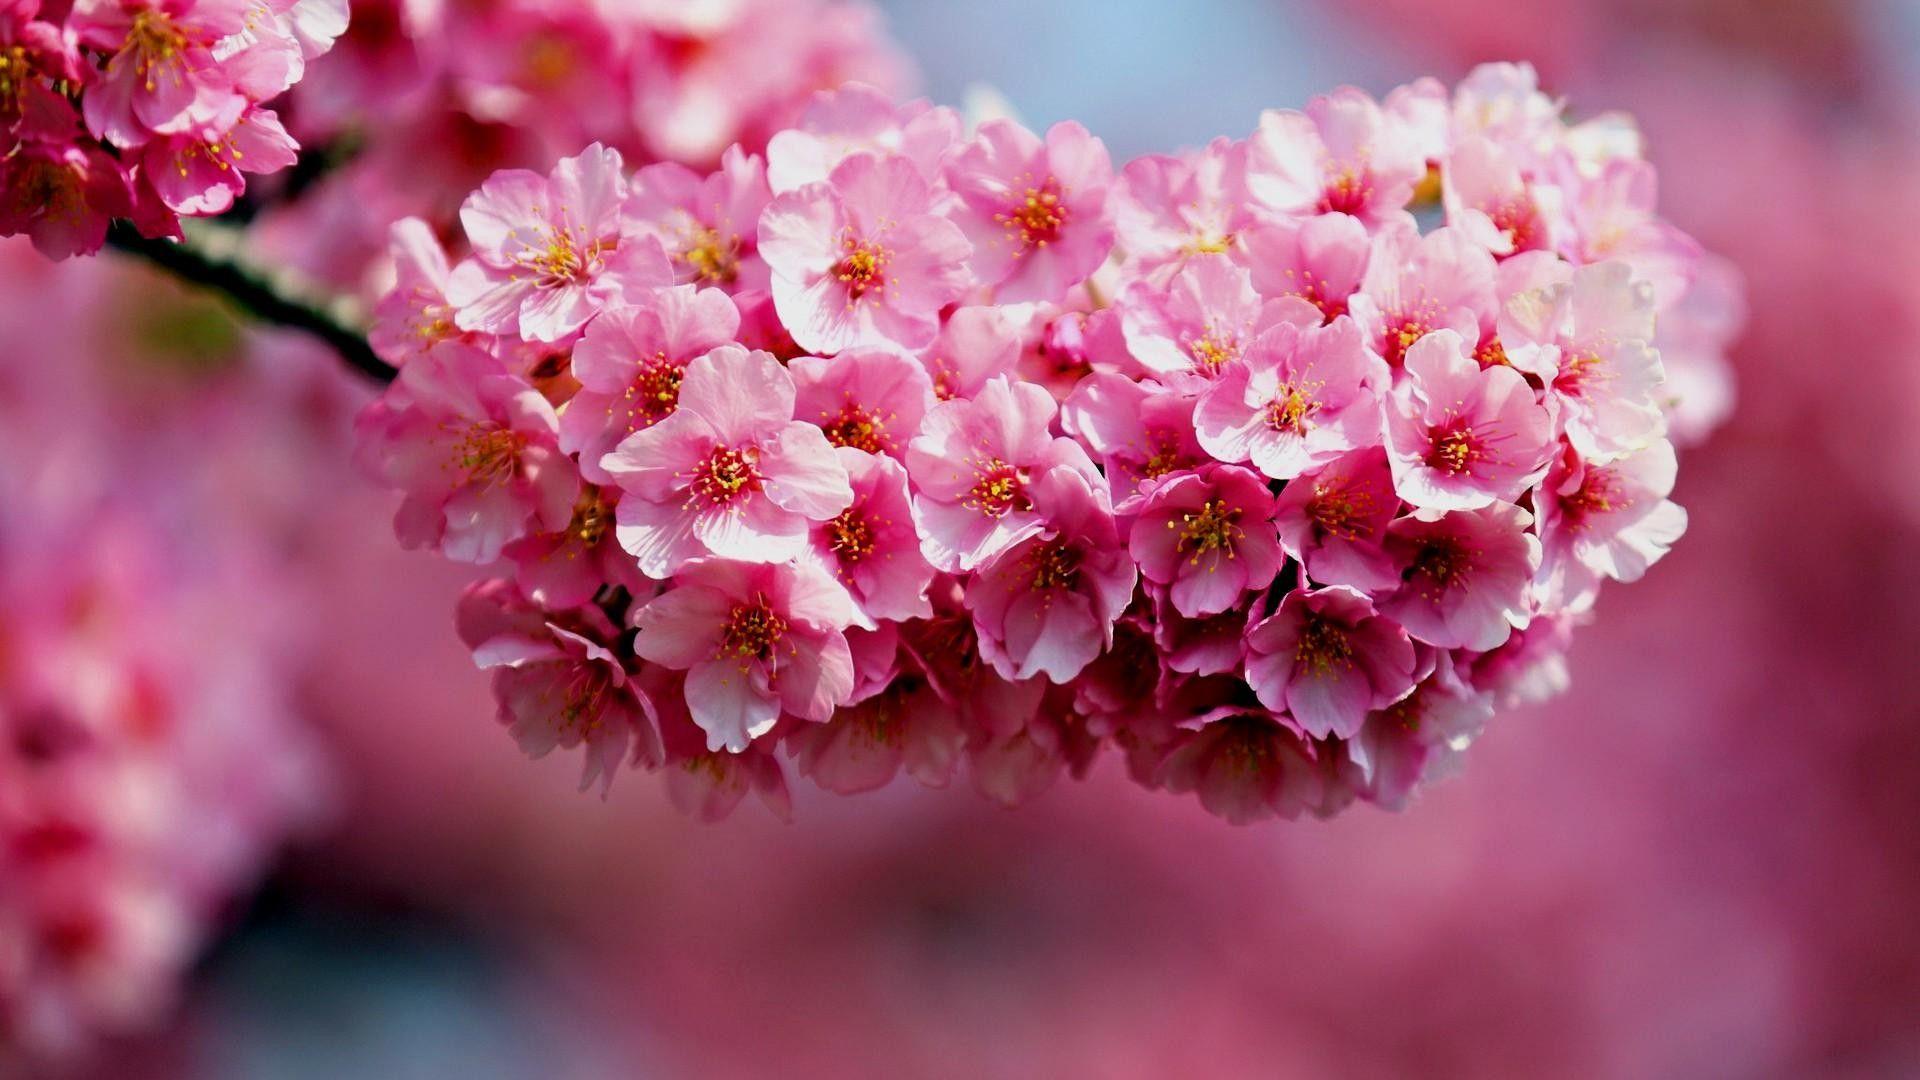 1080p Beautiful Nature Wallpaper Flower Desktop Background